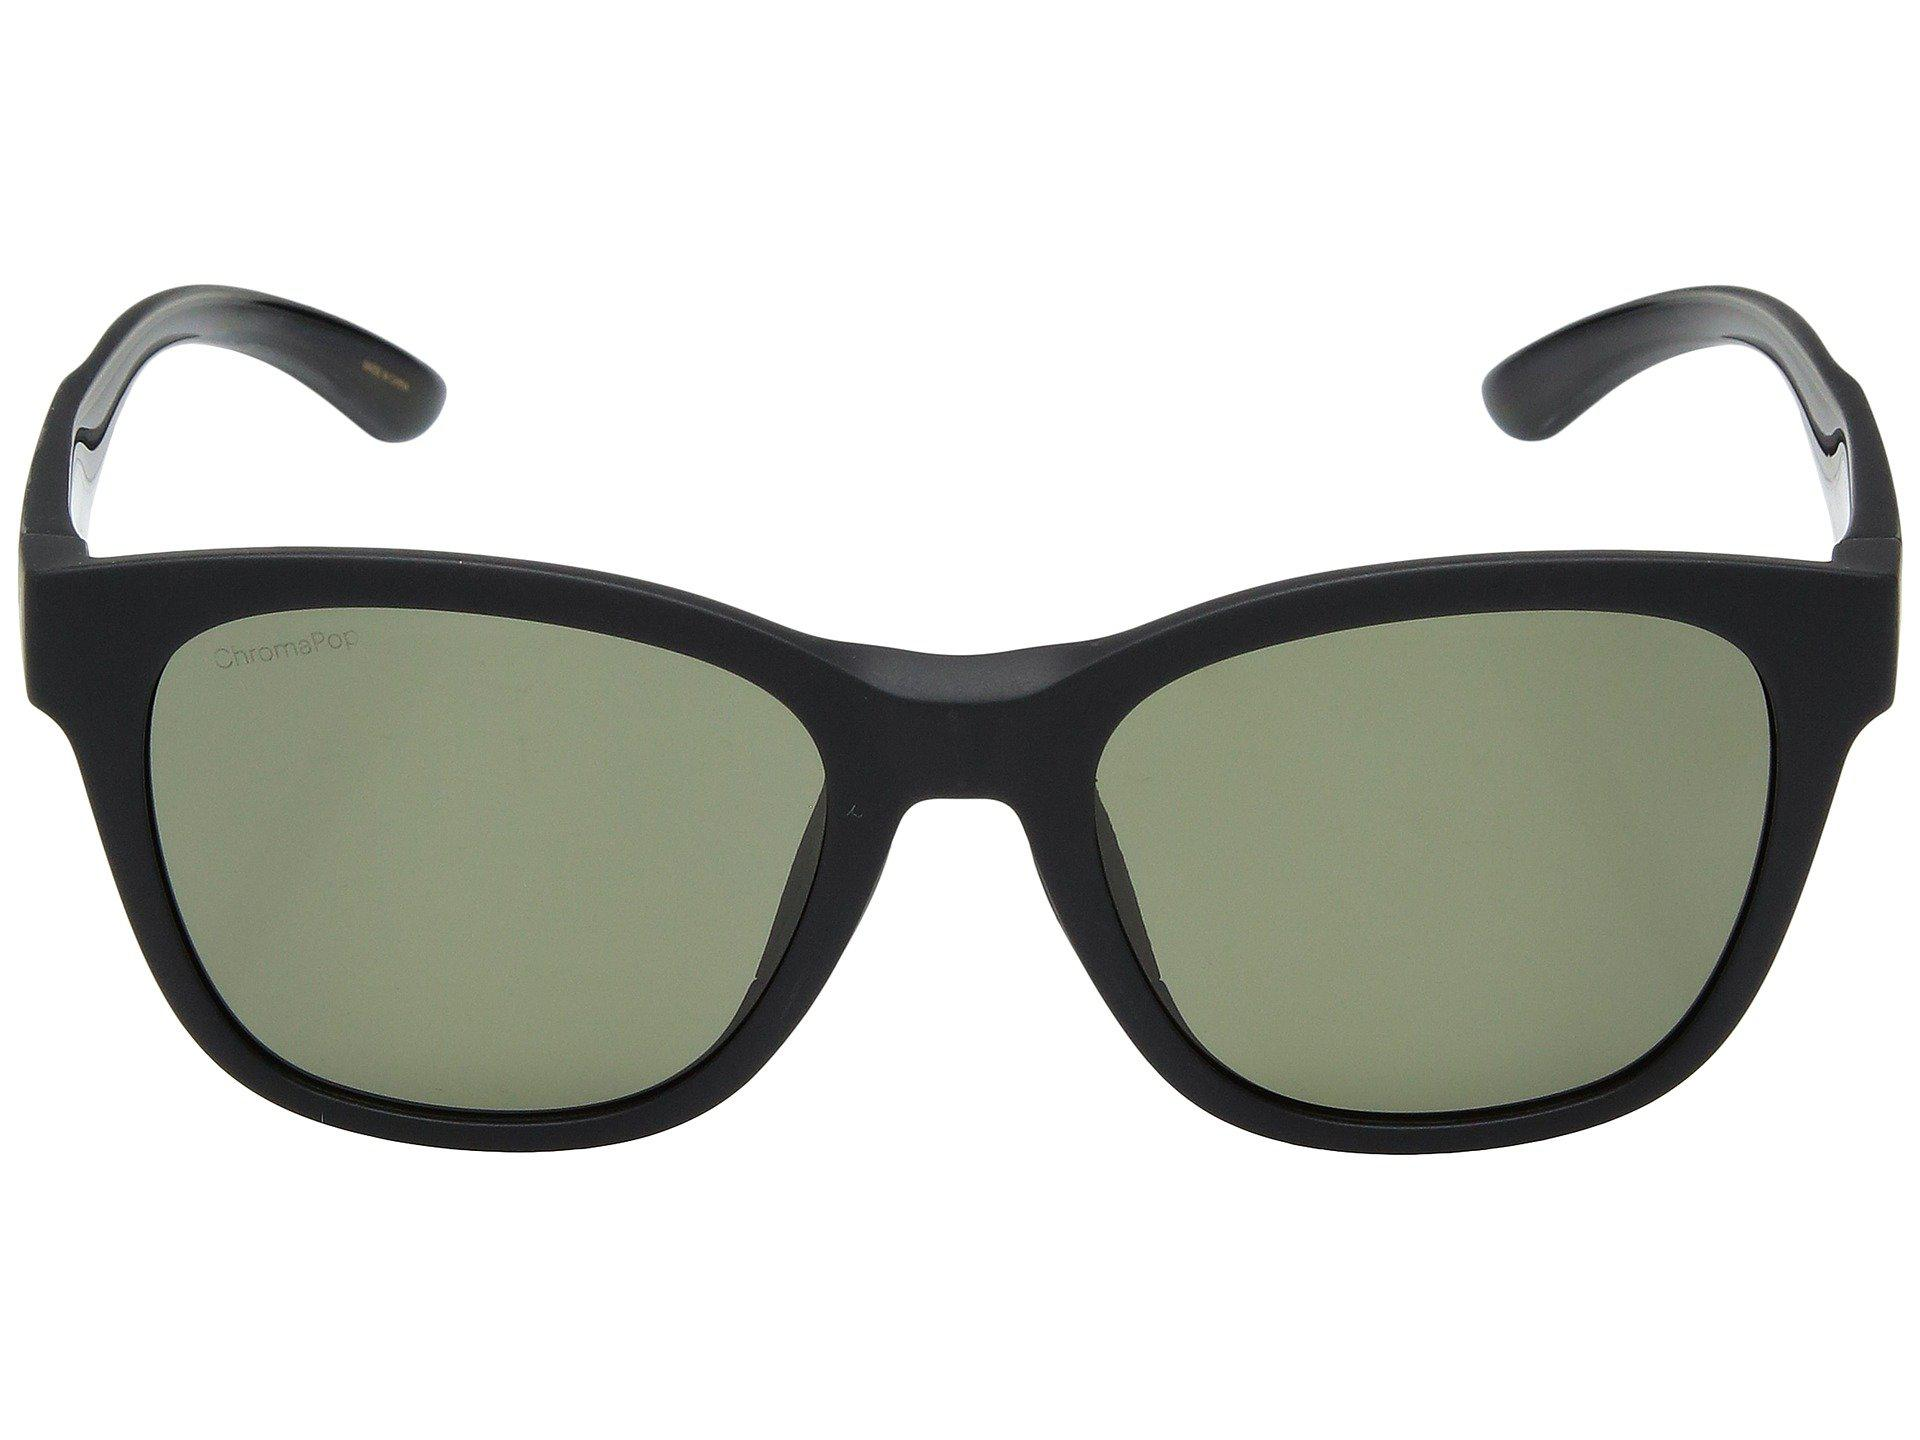 187ff73e33d Smith Optics - Caper (matte Black gray Green Chromapoptm Polarized Lens) Athletic  Performance. View fullscreen